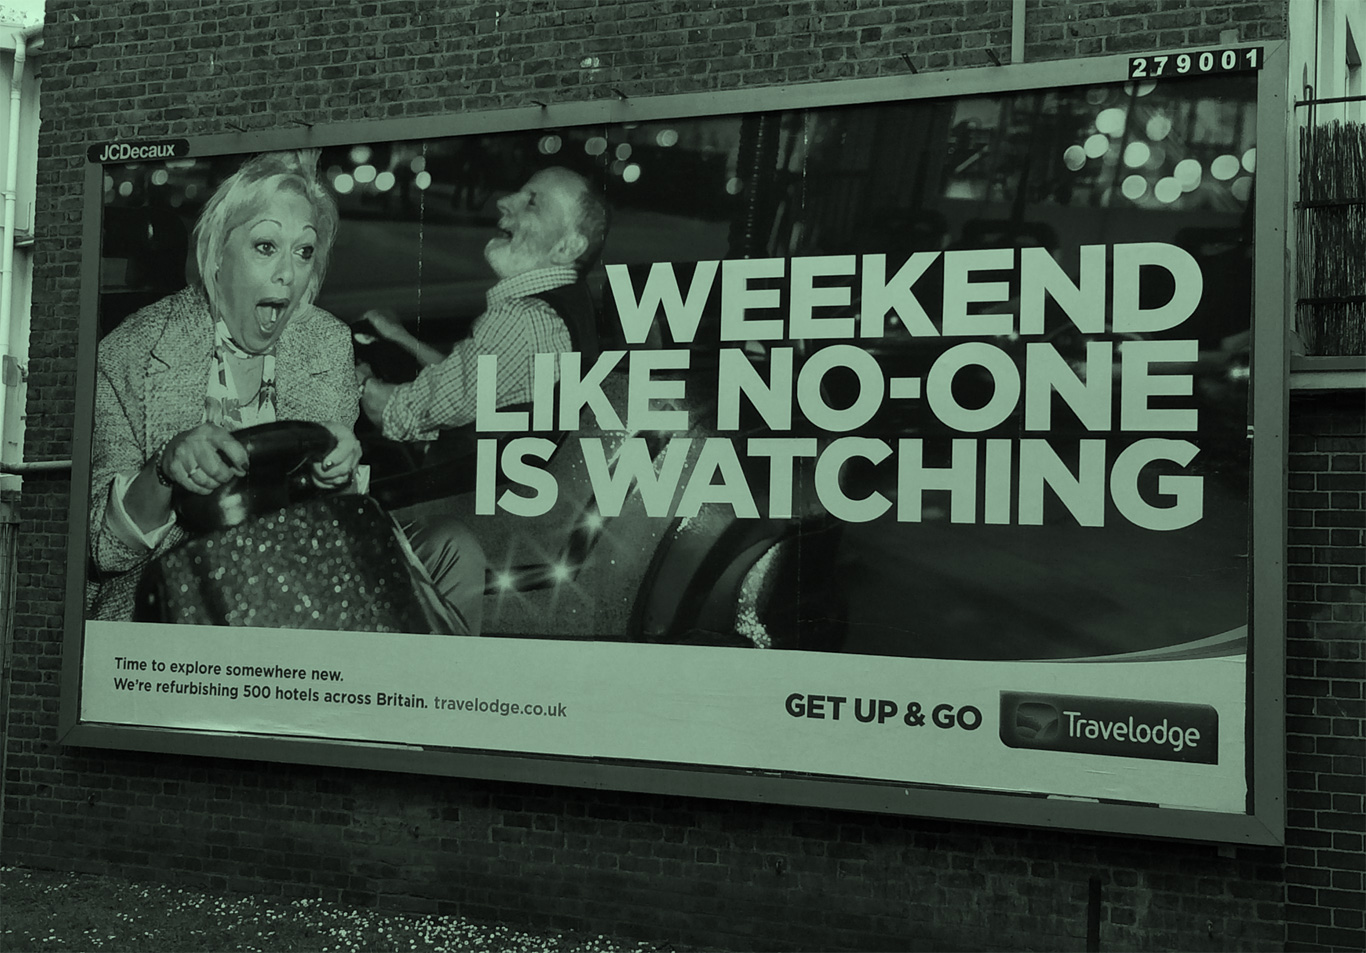 Travelodge ad